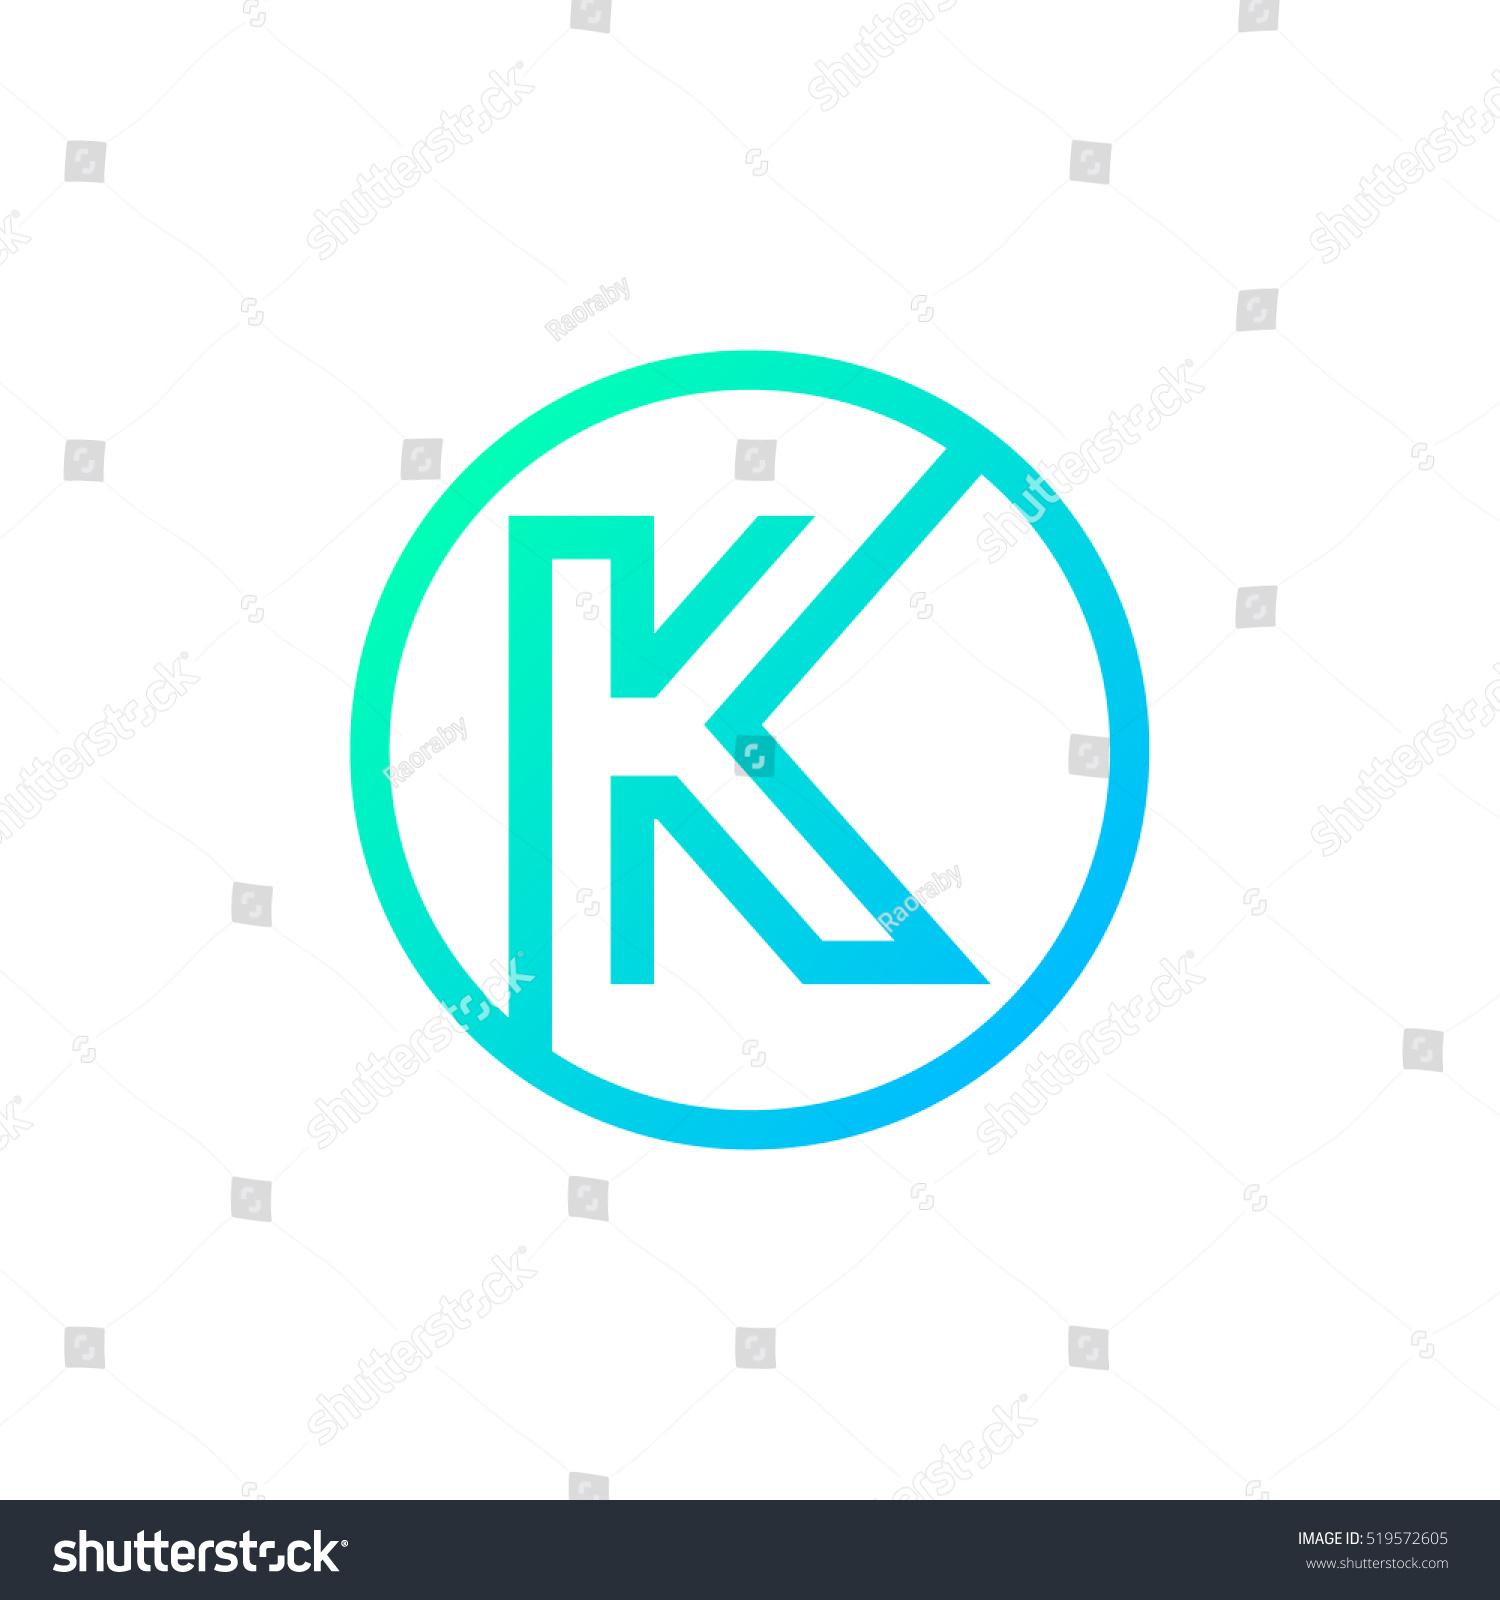 Letter K Logo Circle Shape Symbol Digital Technology Media Stock